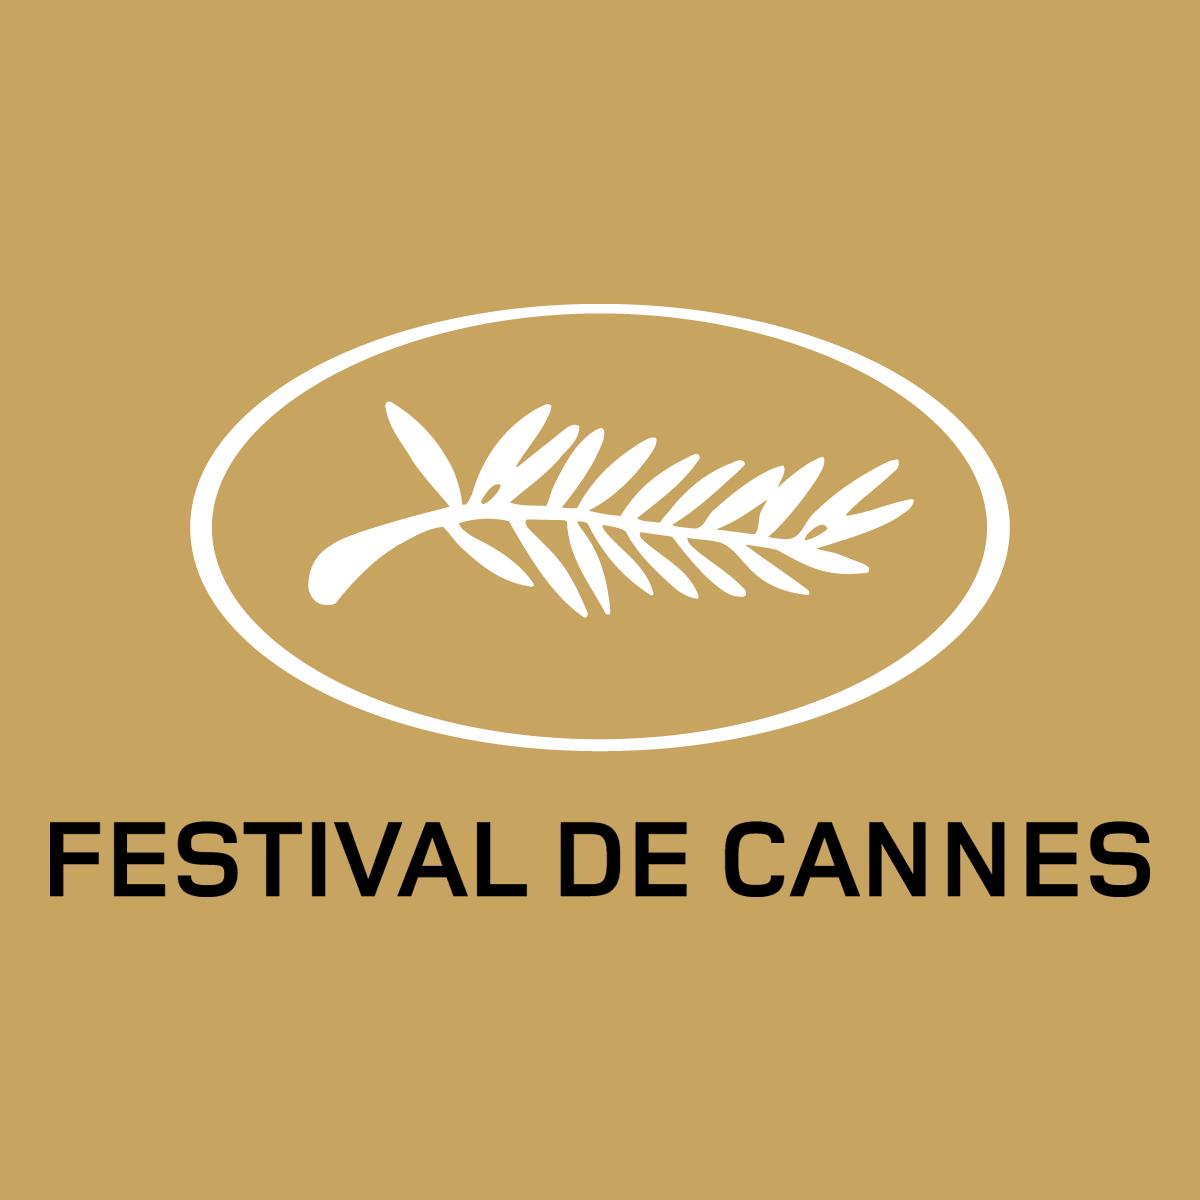 لوگو جشنواره فیلم کن فستیوال فیلم کن Cannes Film Festival Festival de Cannes